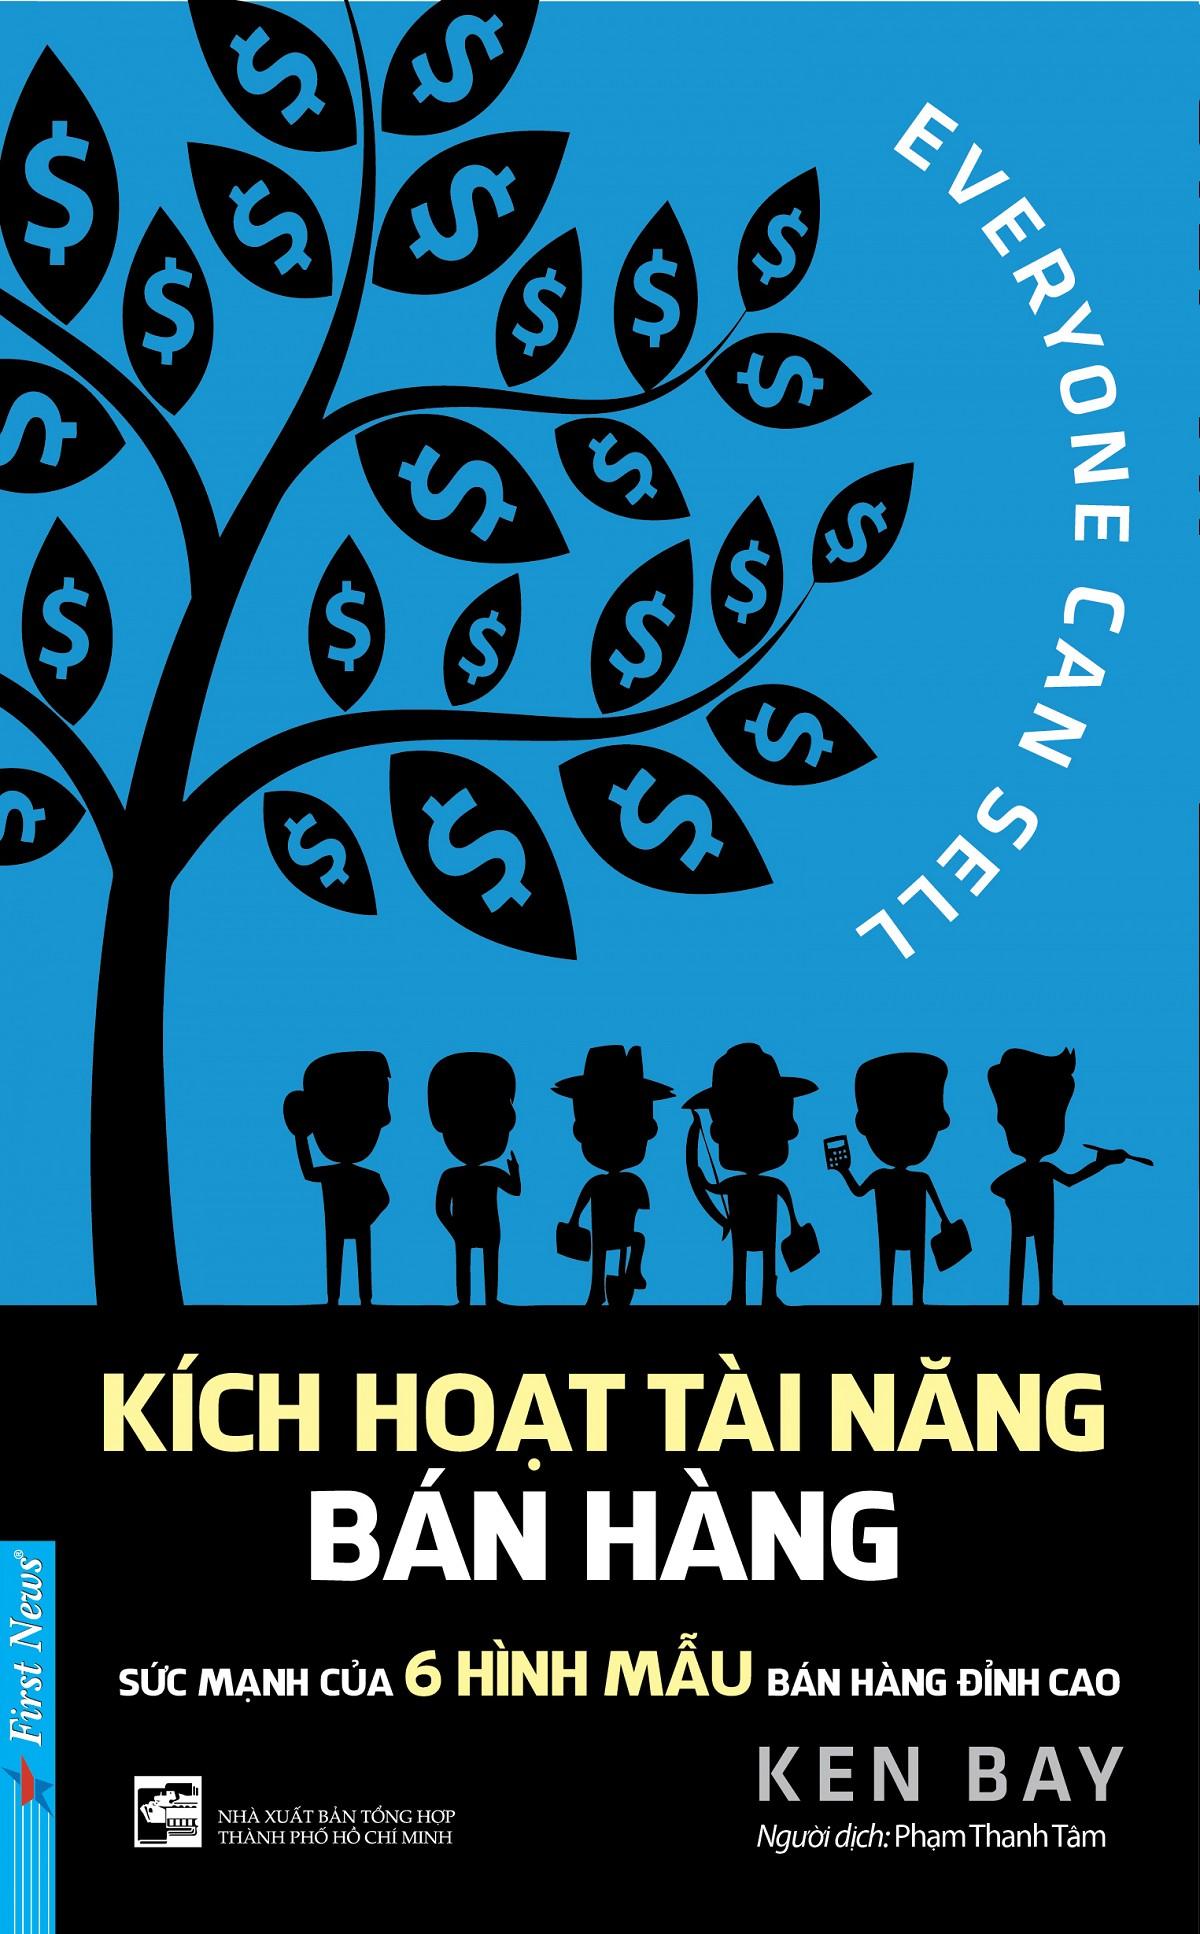 kichhoattainangbanhang1.u2469.d20161117.t155504.616435.jpg